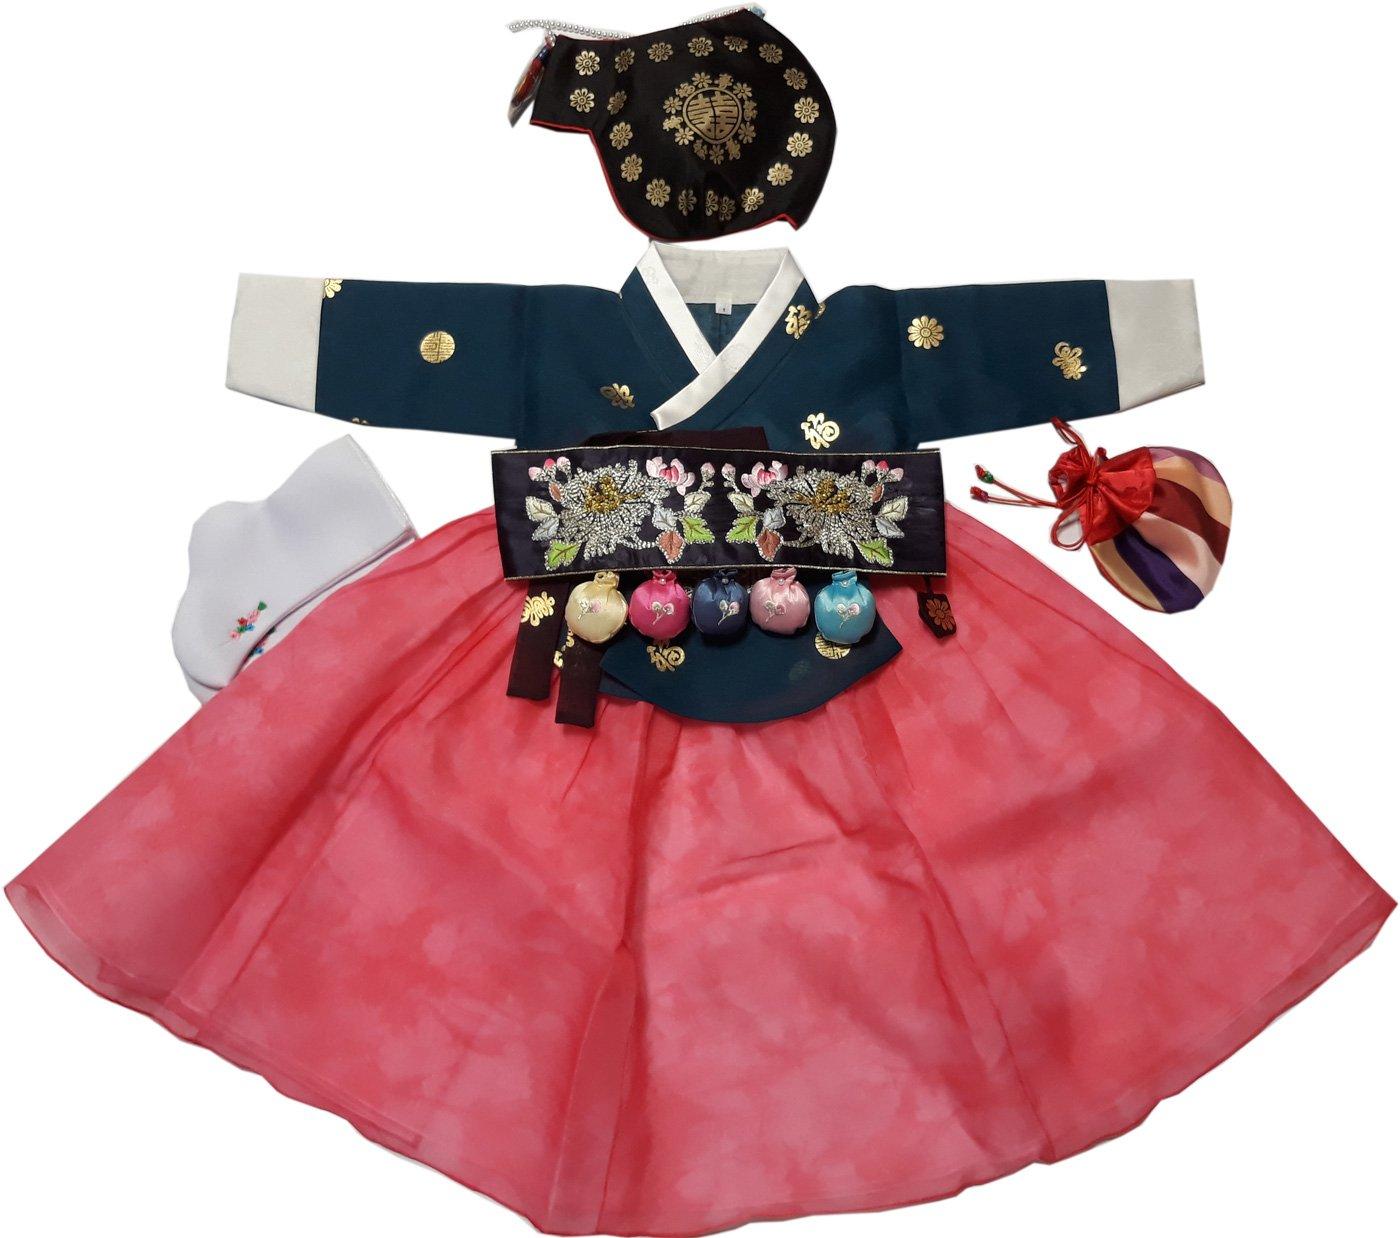 Hanboks Korean Traditional Costumes Girls Babies Dress 1st Birthday DOLBOK hg1003/f